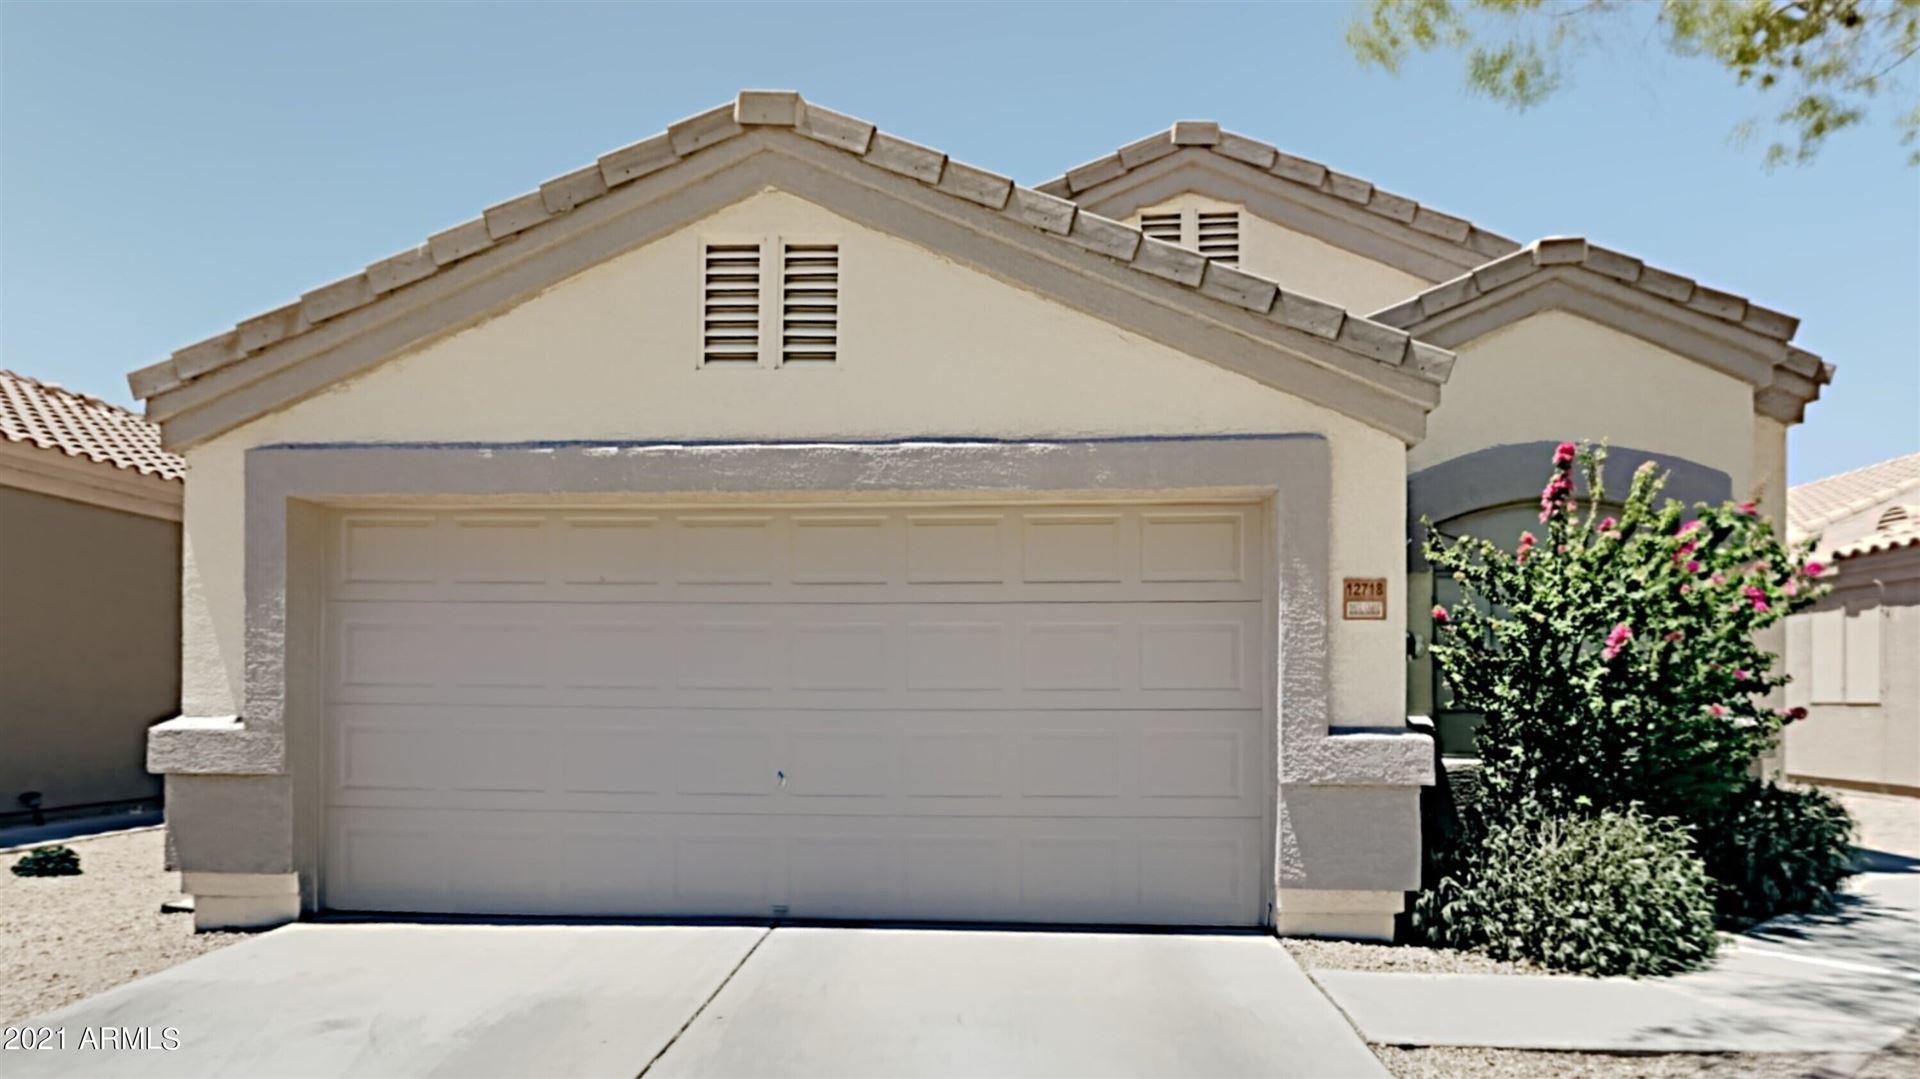 Photo of 12718 W SANTA FE Lane, El Mirage, AZ 85335 (MLS # 6263399)